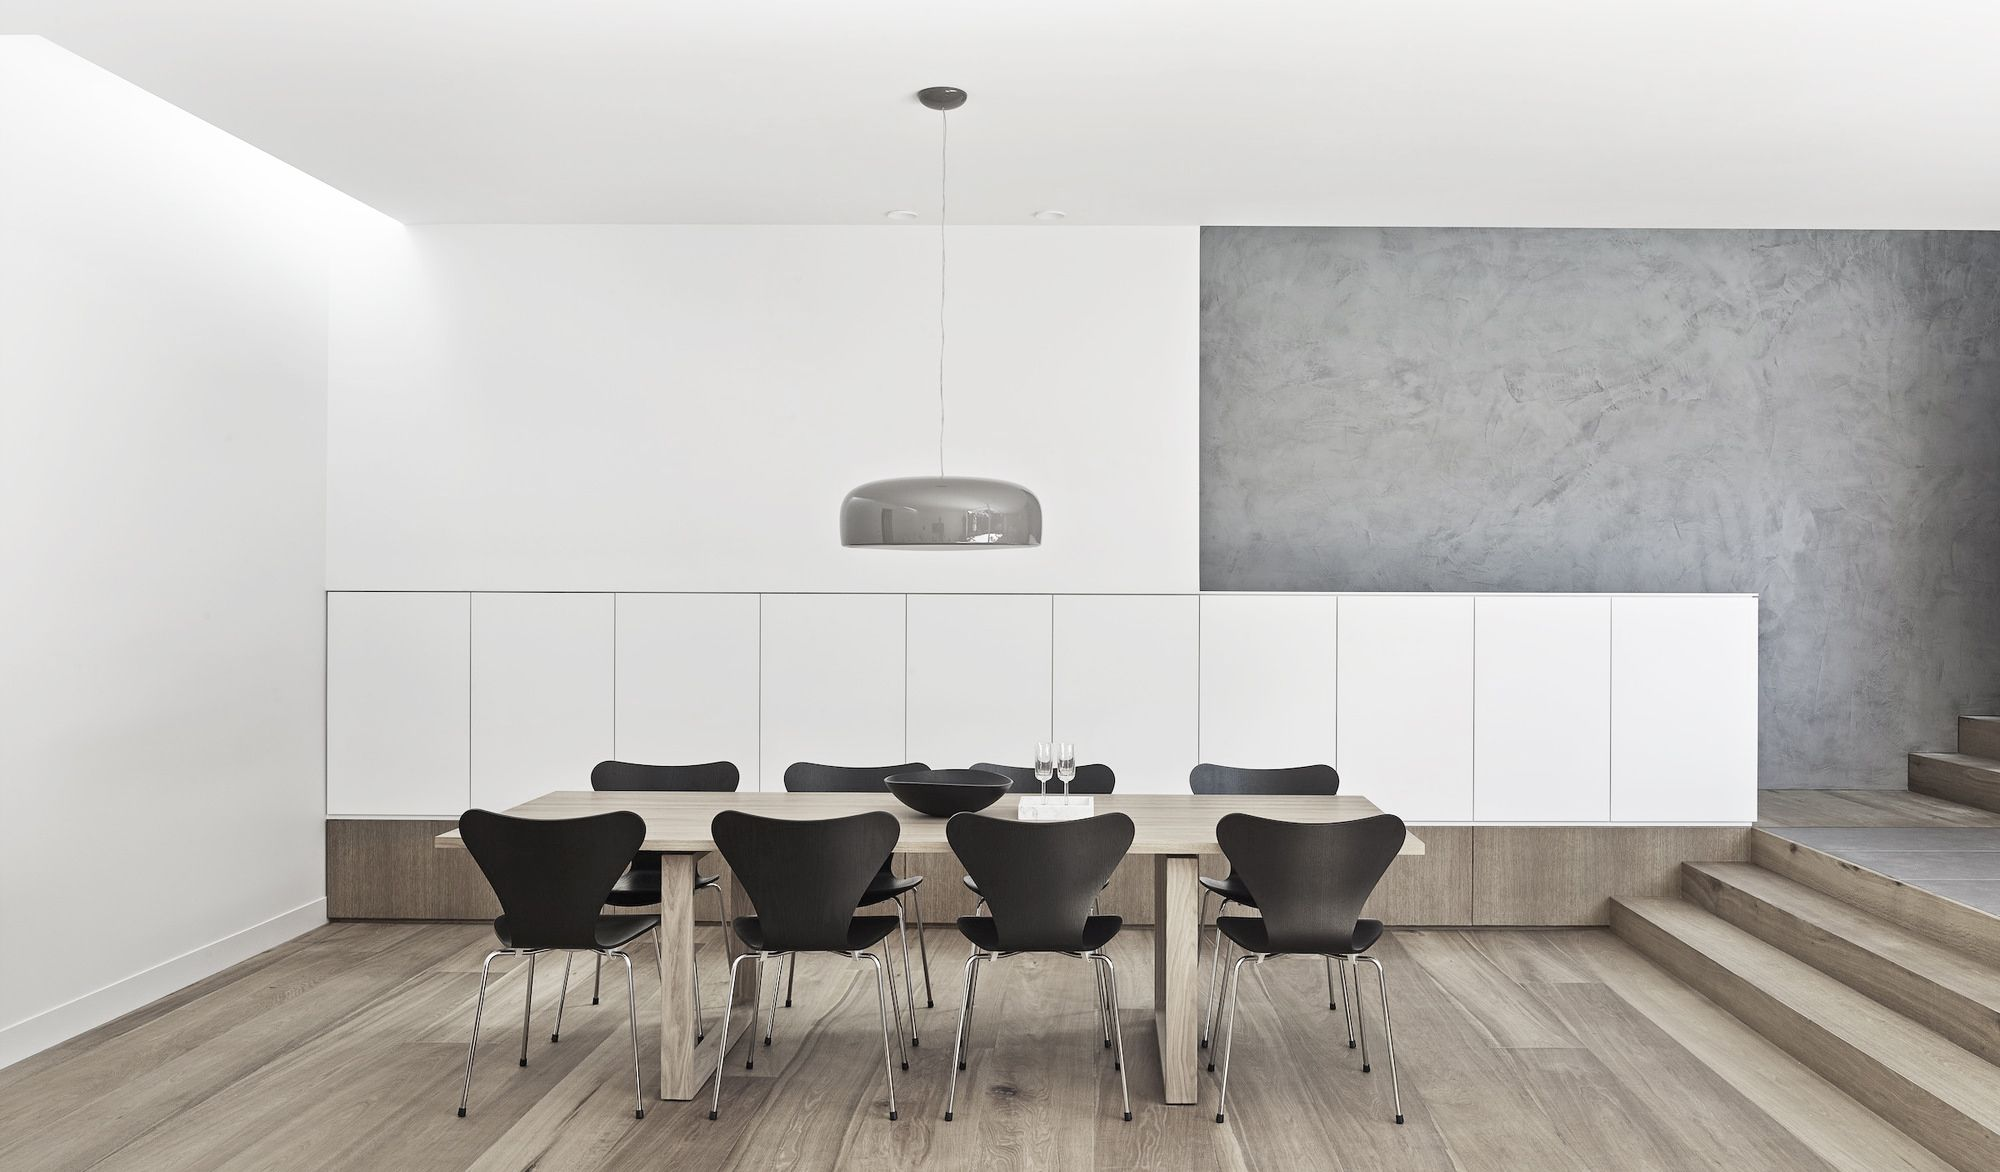 Adaptable house henning larsen architects gxn nội thất